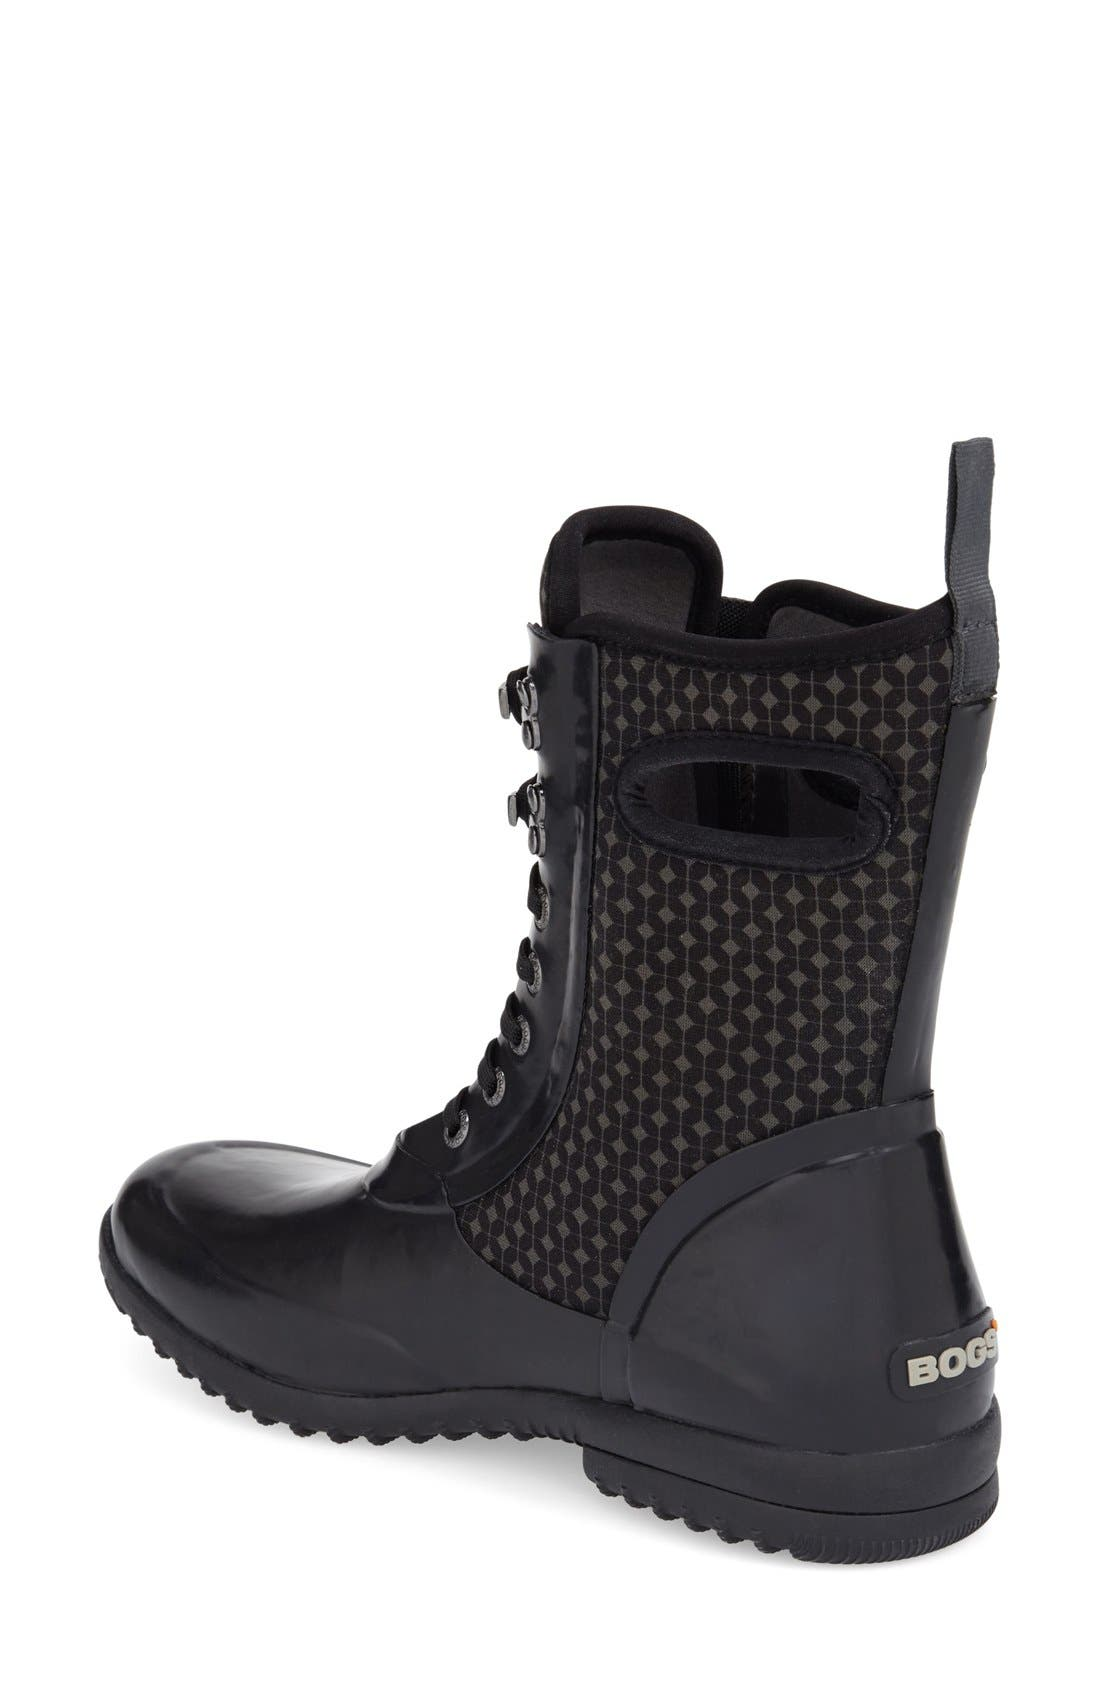 'Sidney Cravat' Lace-Up Waterproof Boot,                             Alternate thumbnail 2, color,                             009